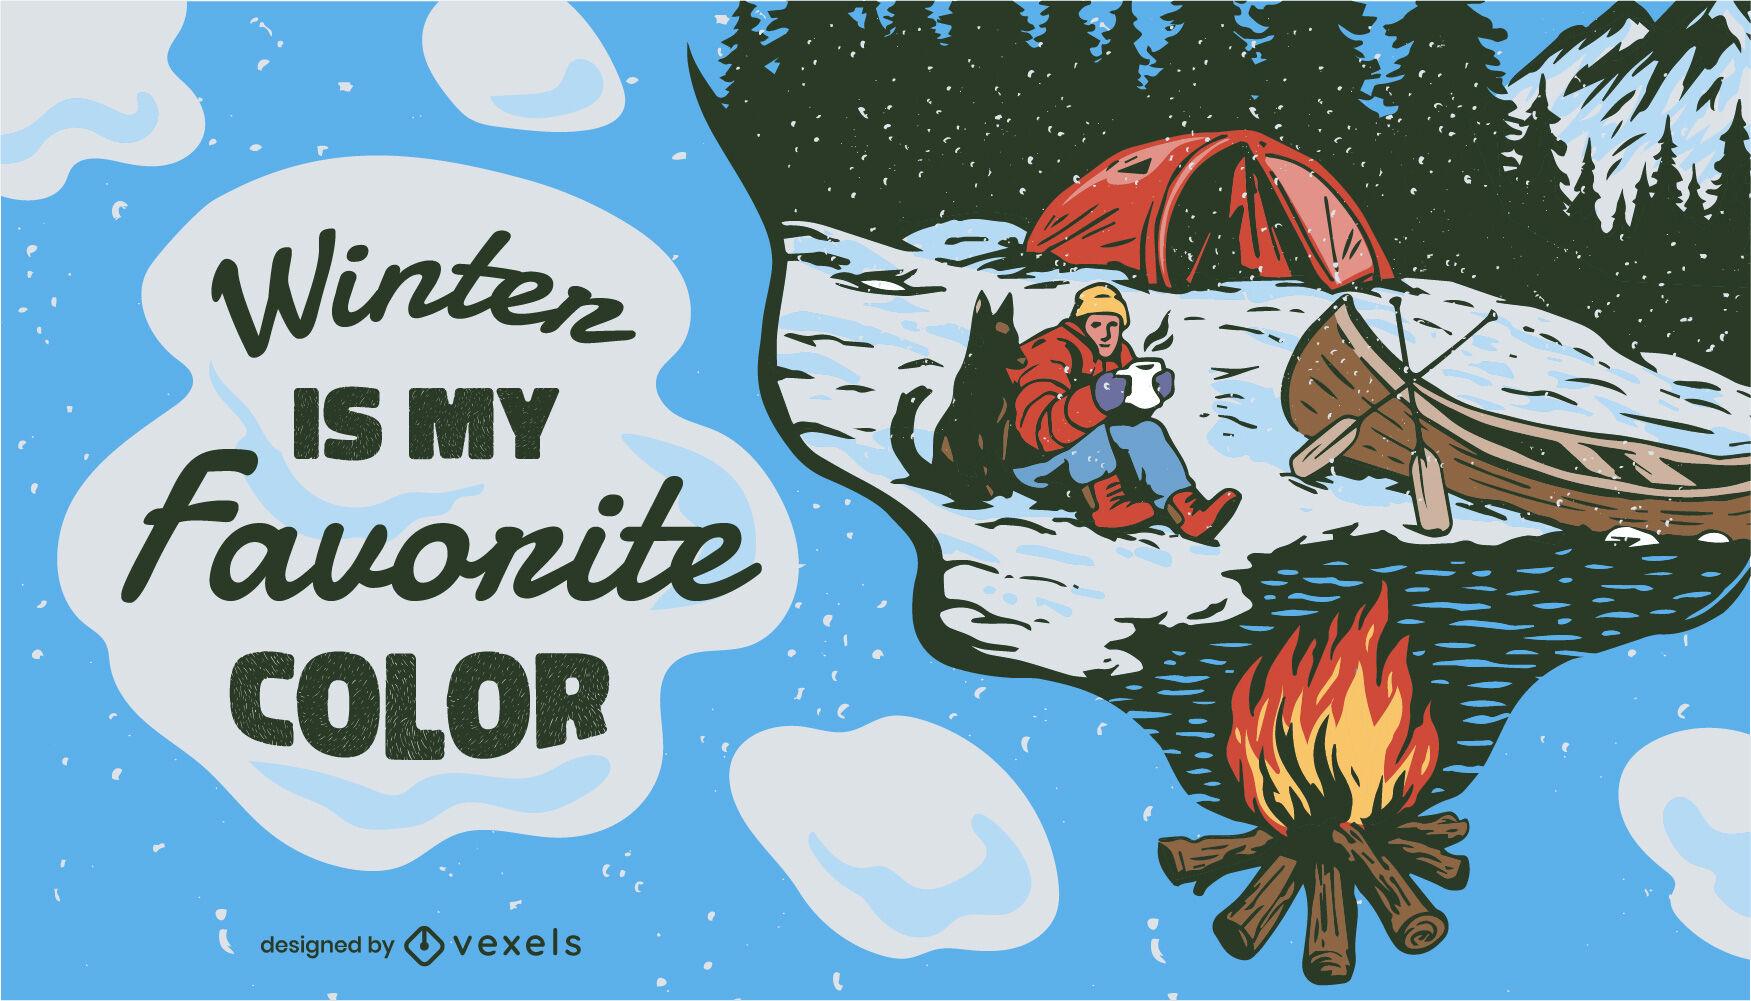 Snowy winter camping trip illustration